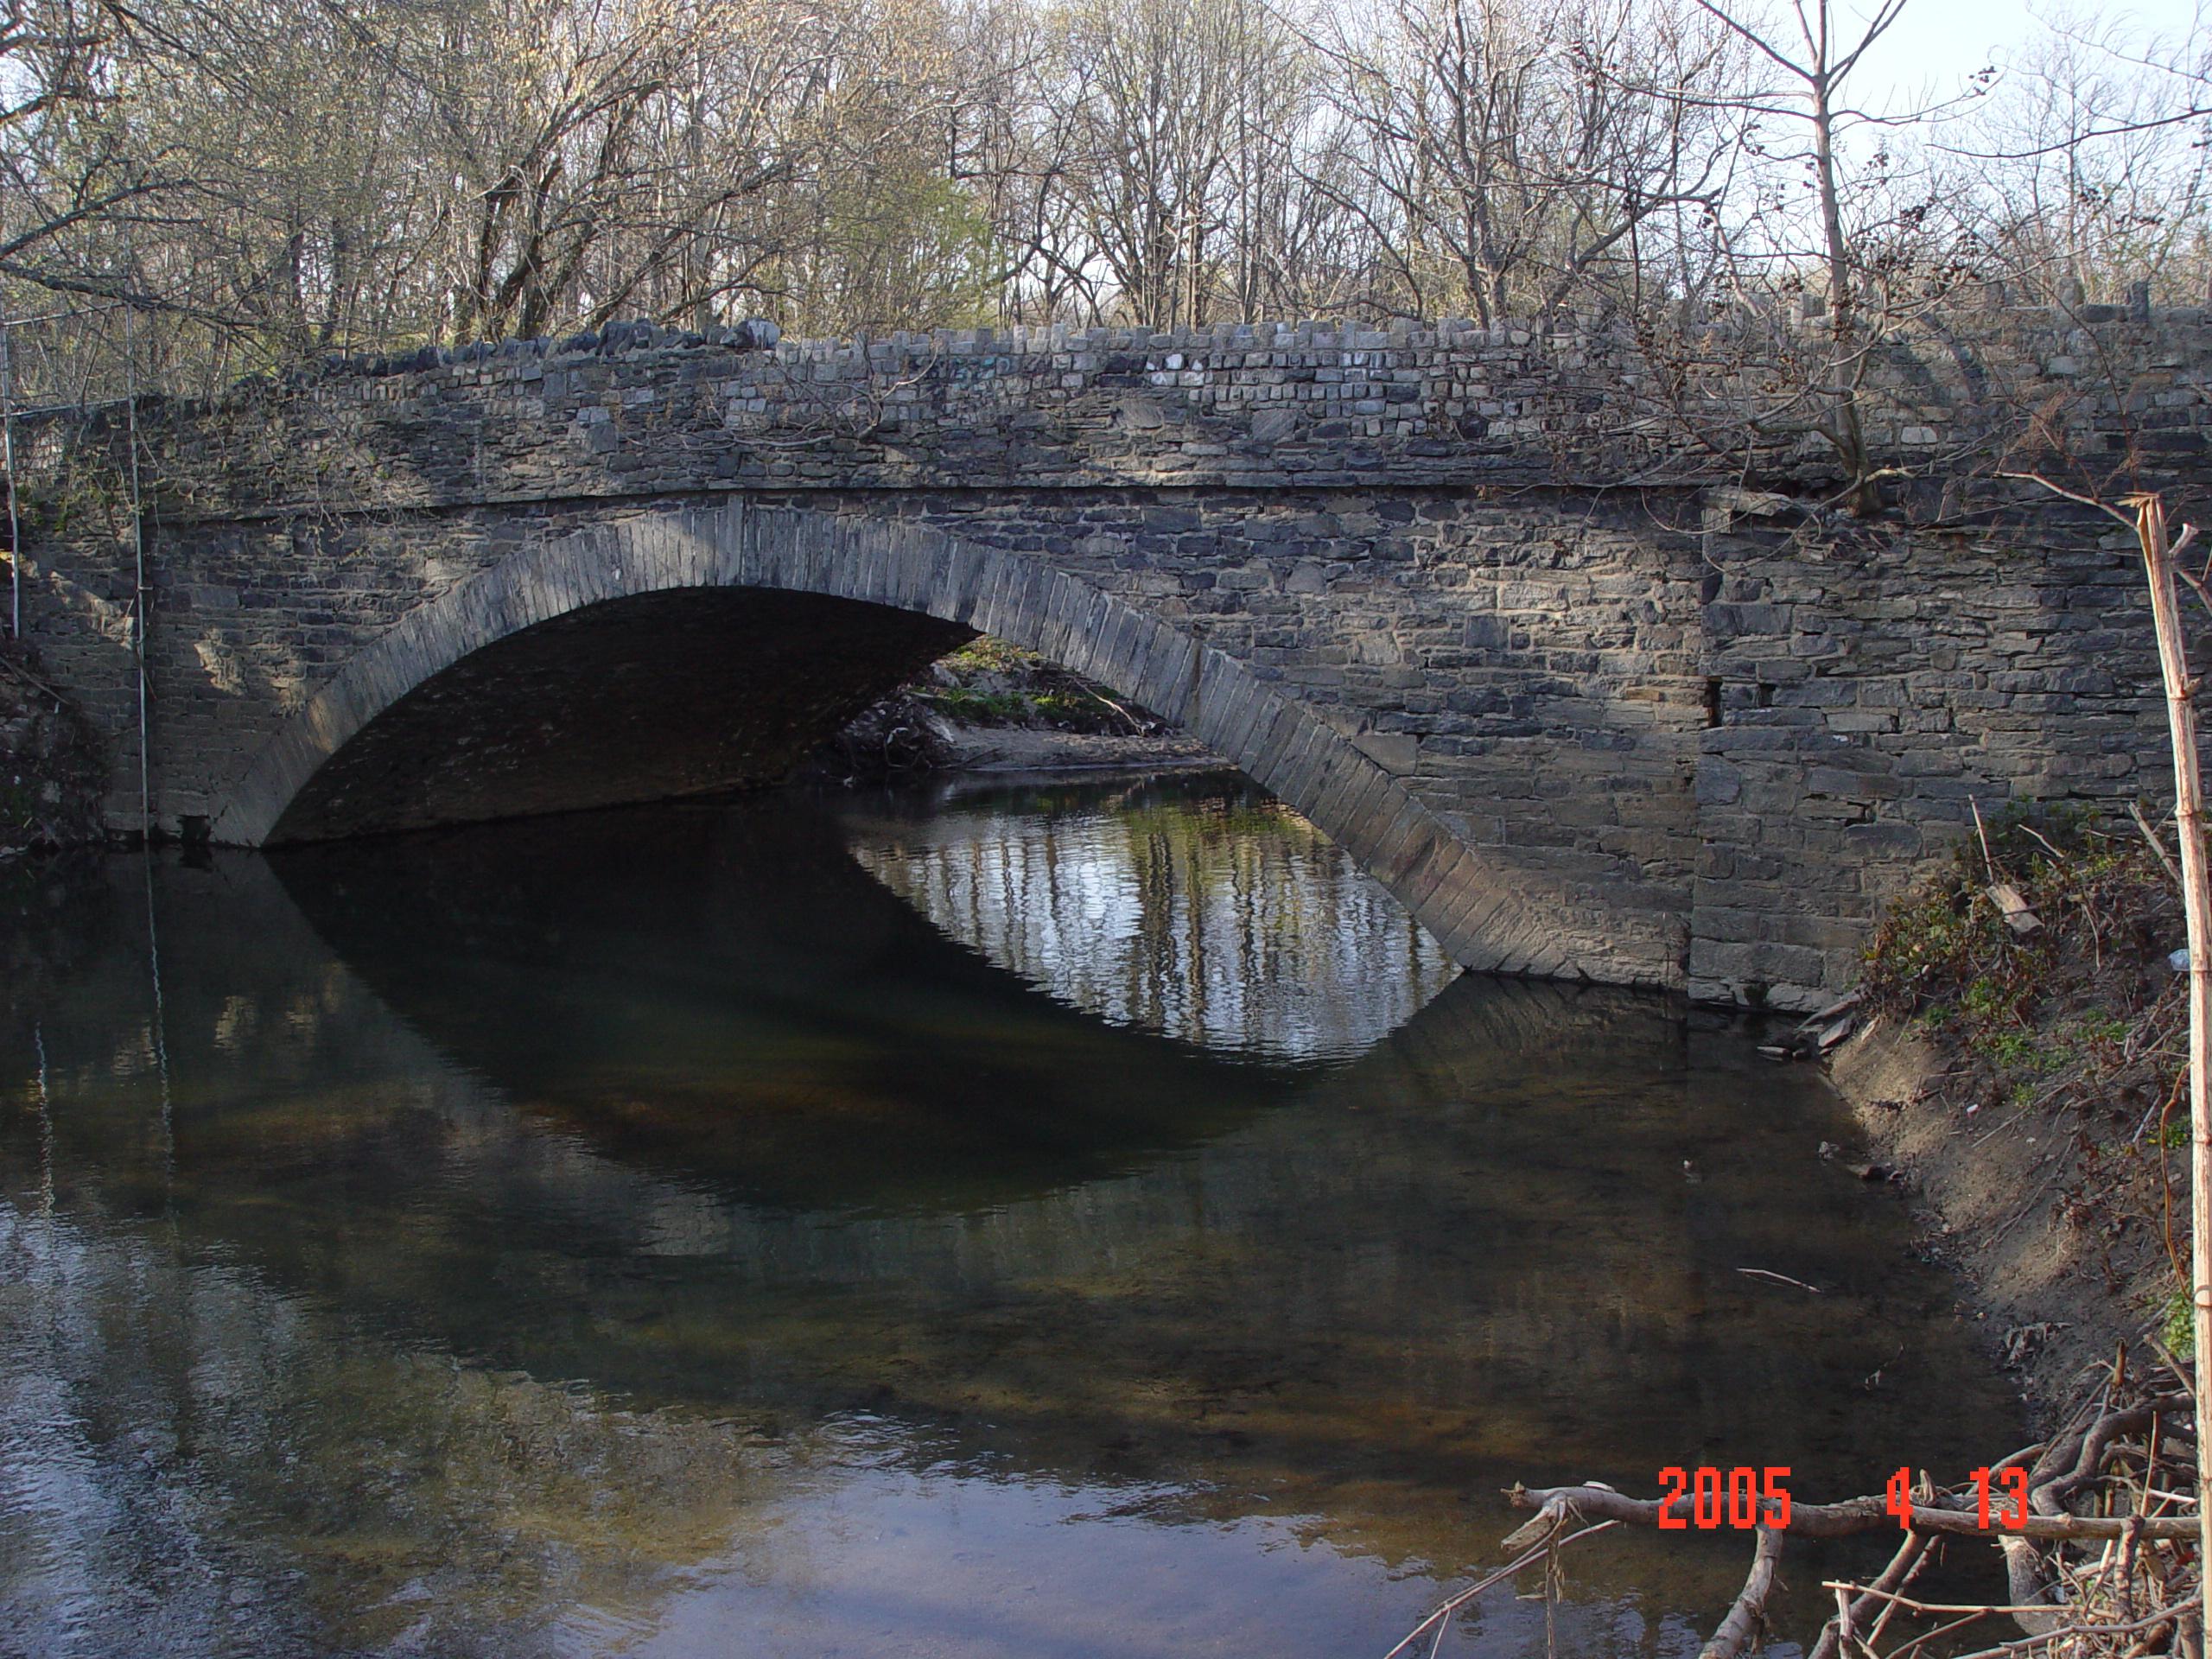 Fisher's Lane Stone Arch Bridge over Tacony Creek